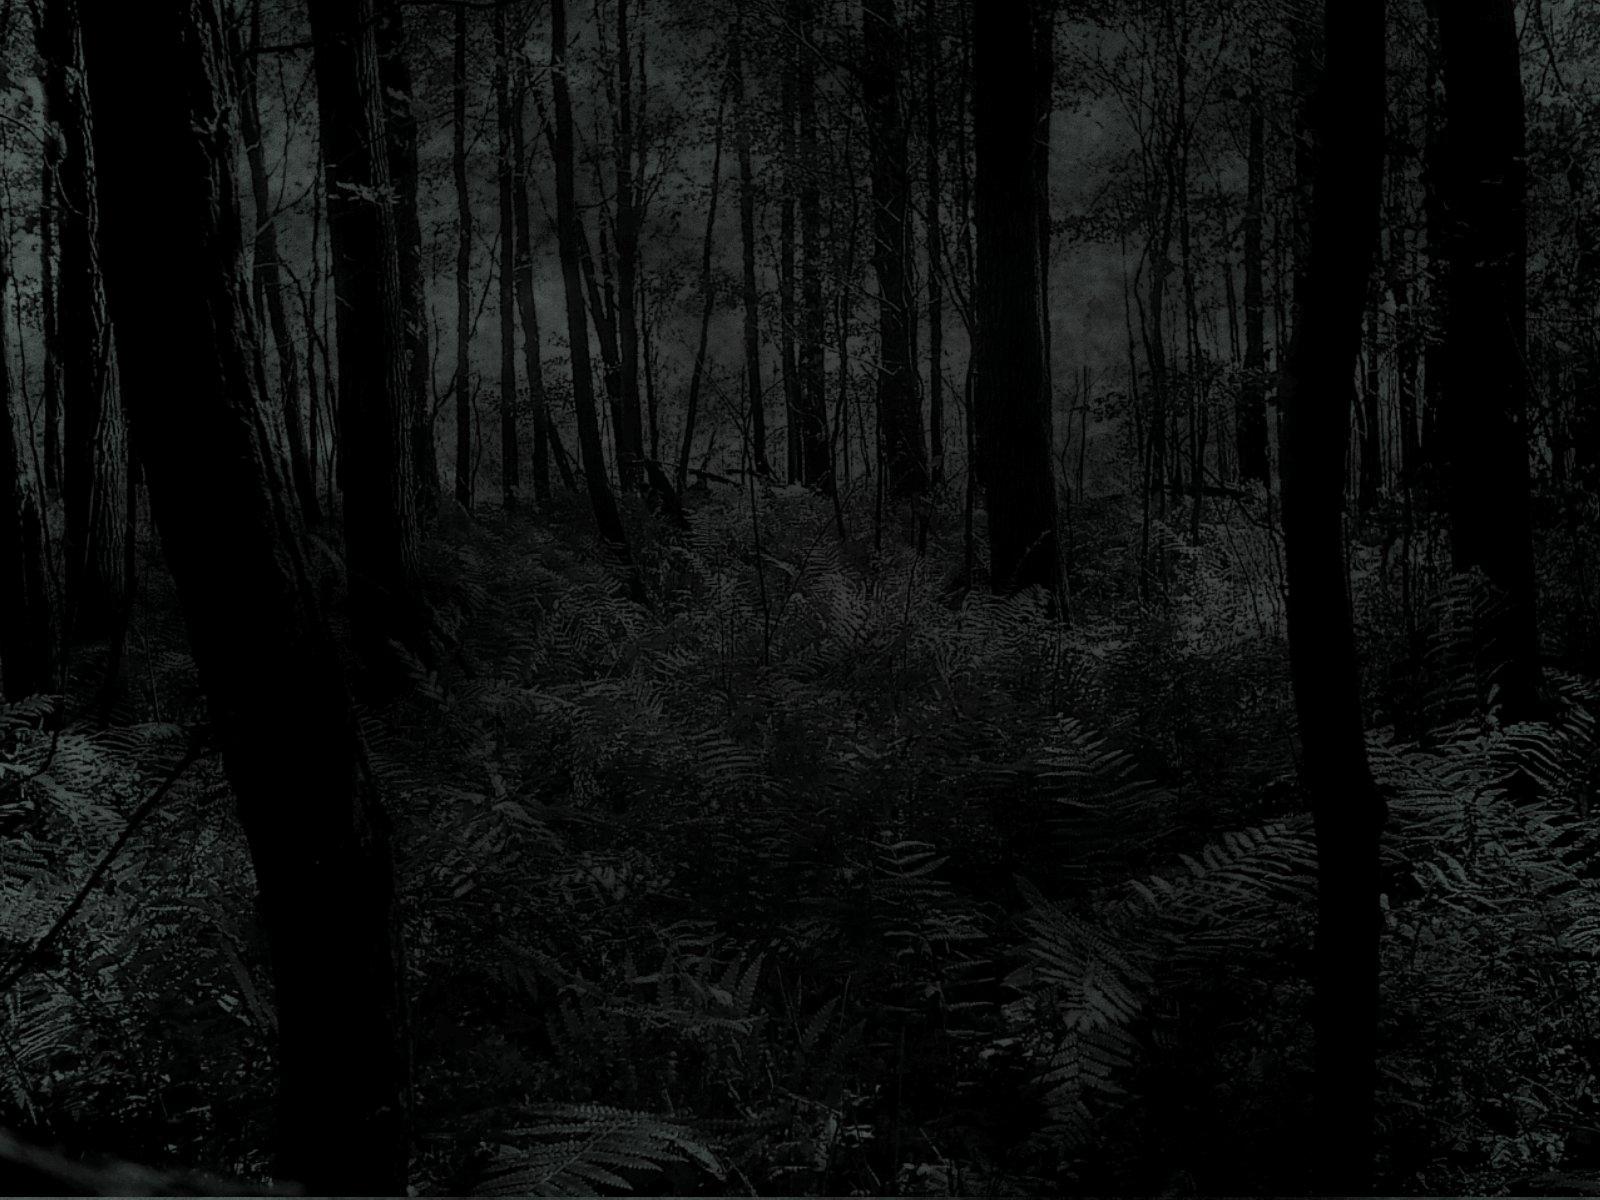 72 Dark Forest Wallpaper On Wallpapersafari